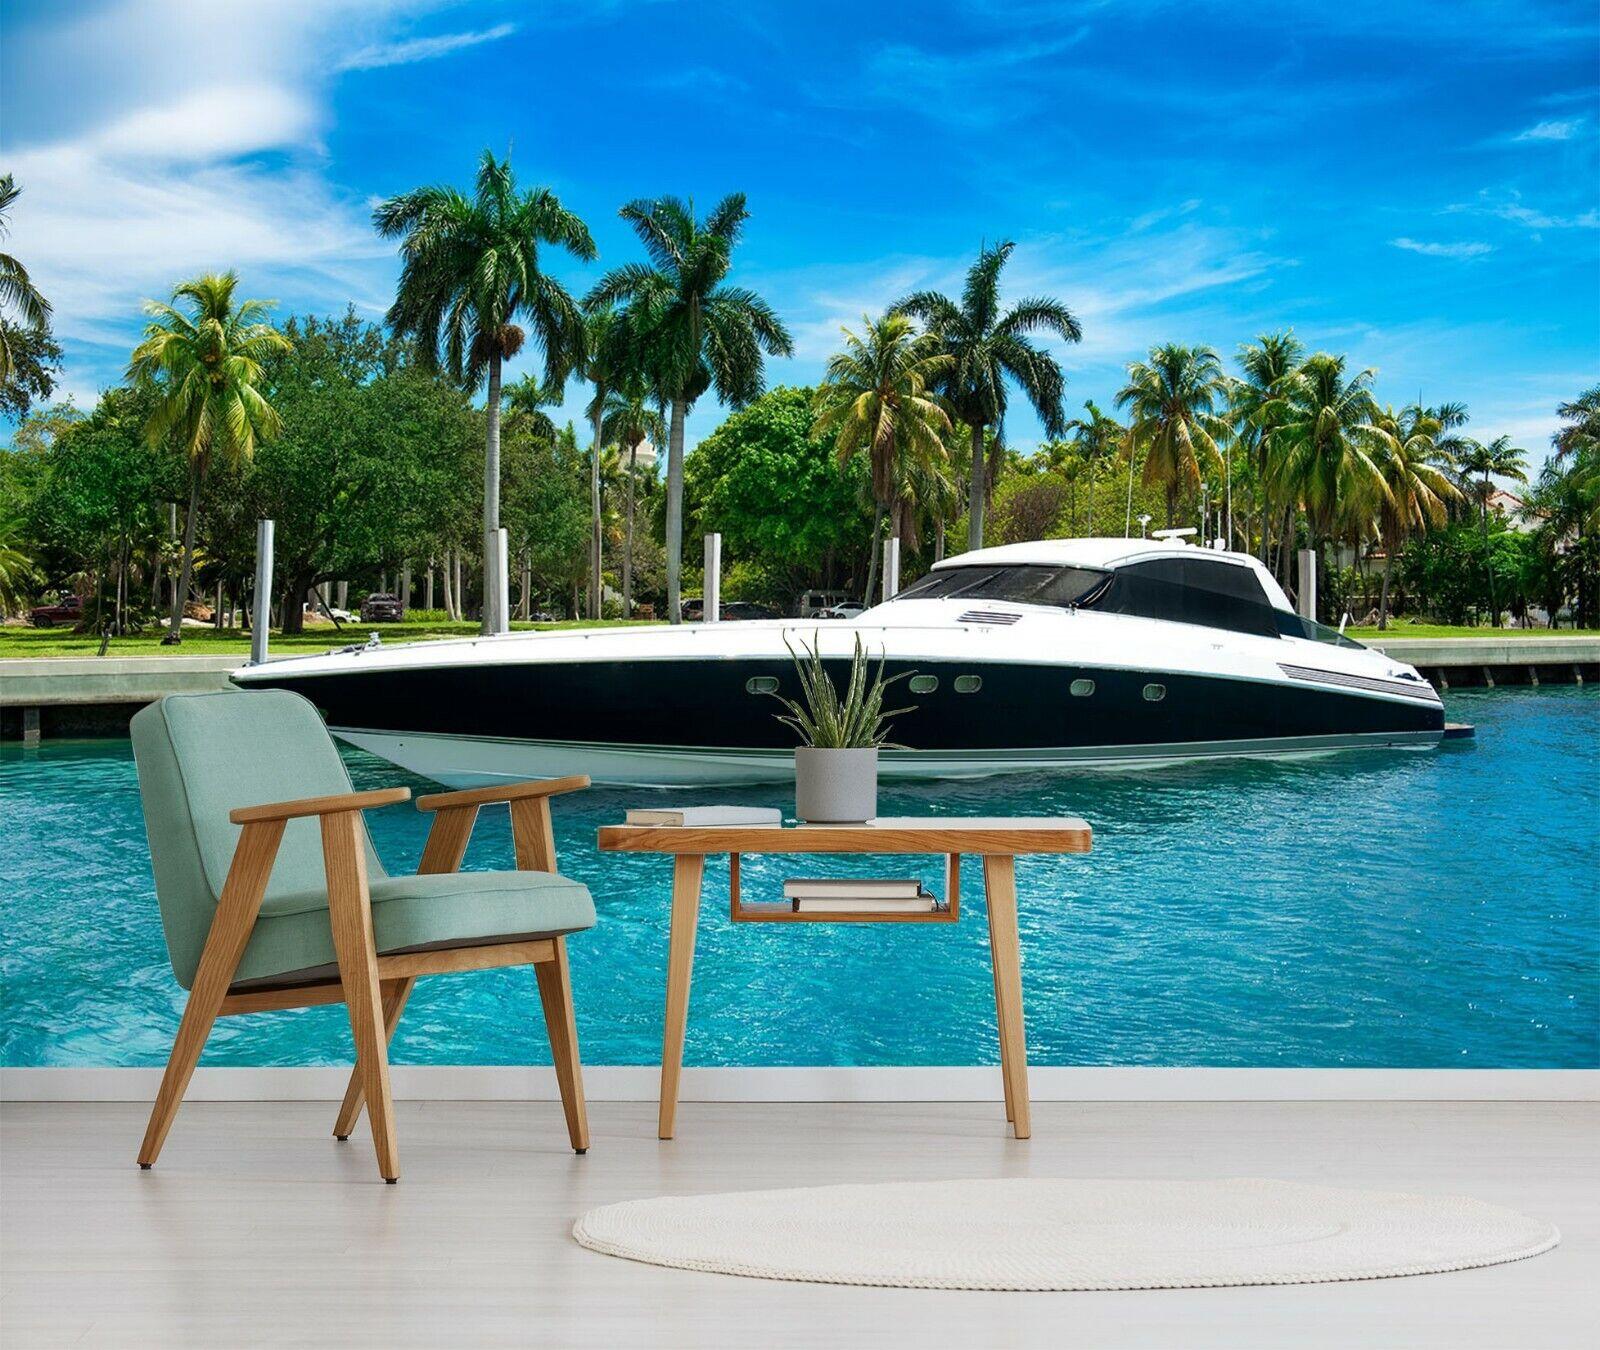 3D Sea Yacht O141 Auto Tapete Wandbild Selbstklebend Abnehmbare Angelia